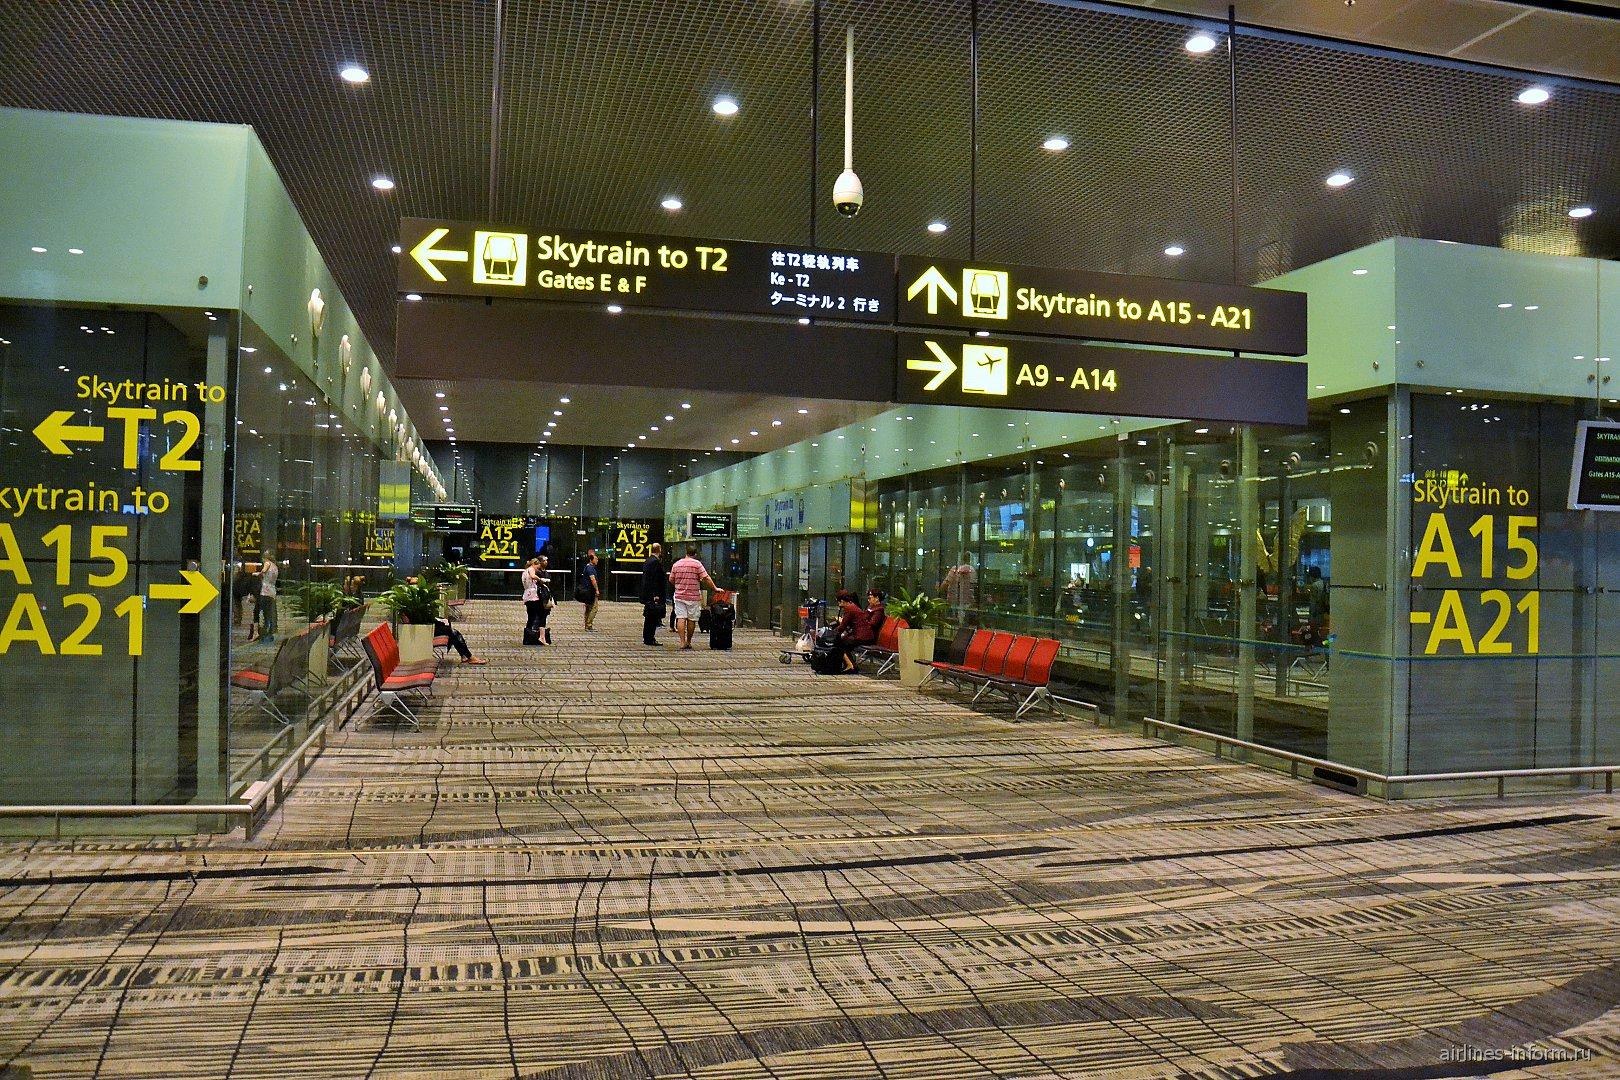 Остановка Skytrain в терминале 3 аэропорта Сингапур Чанги